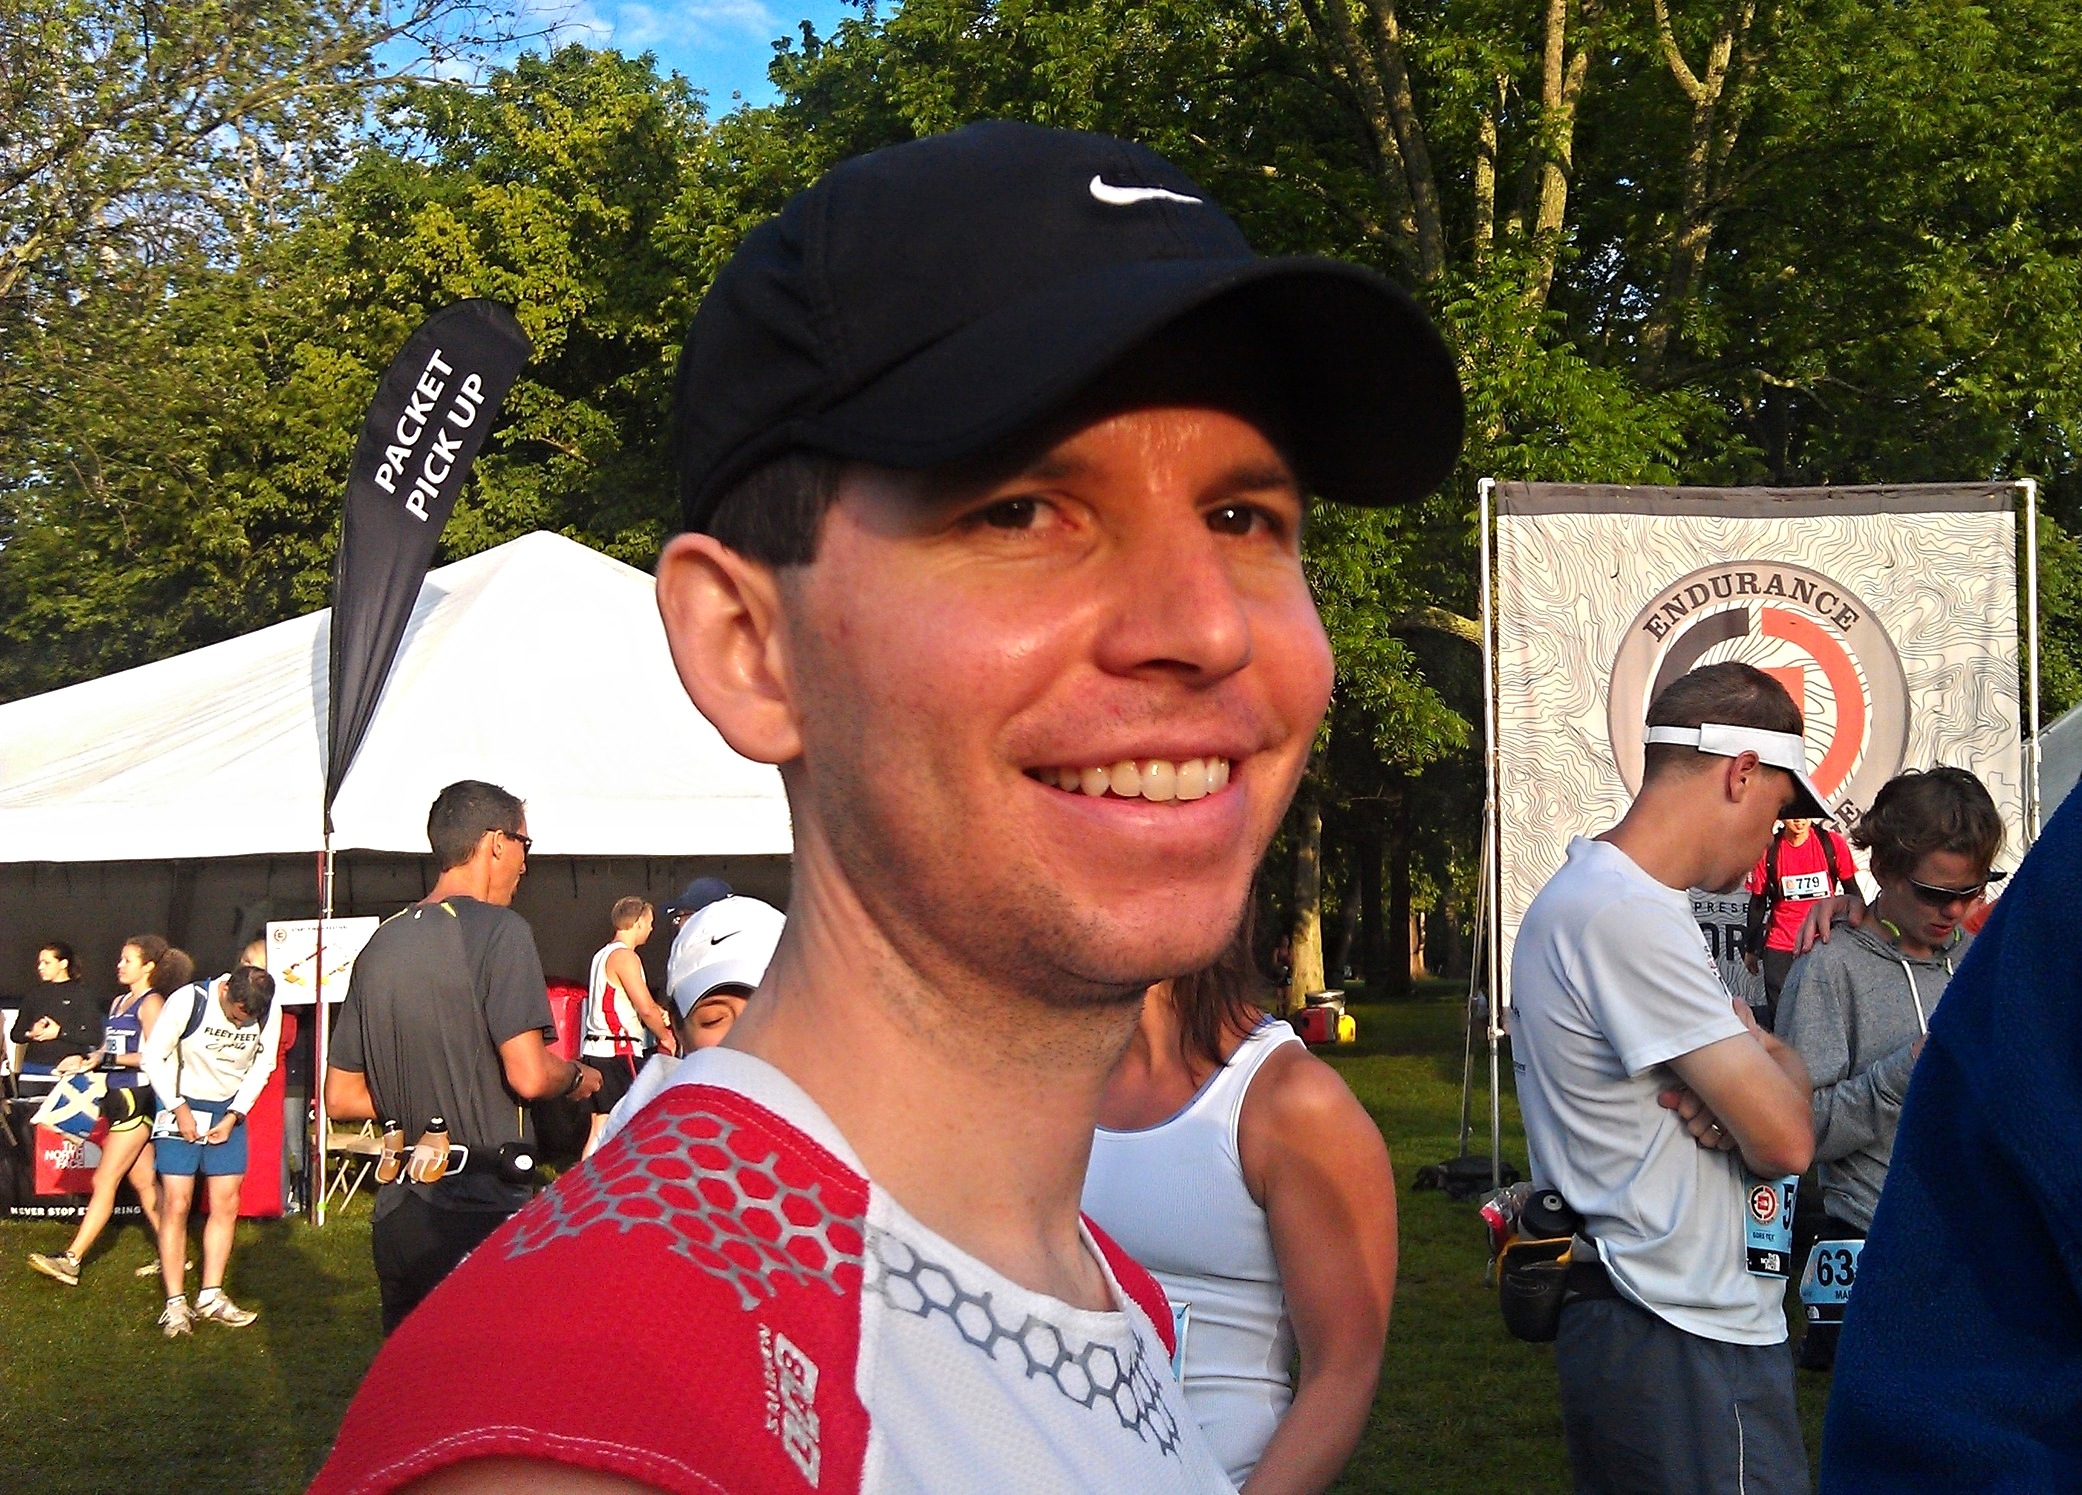 Sean McPherson - San Jose, CA - Runner & Backpacking